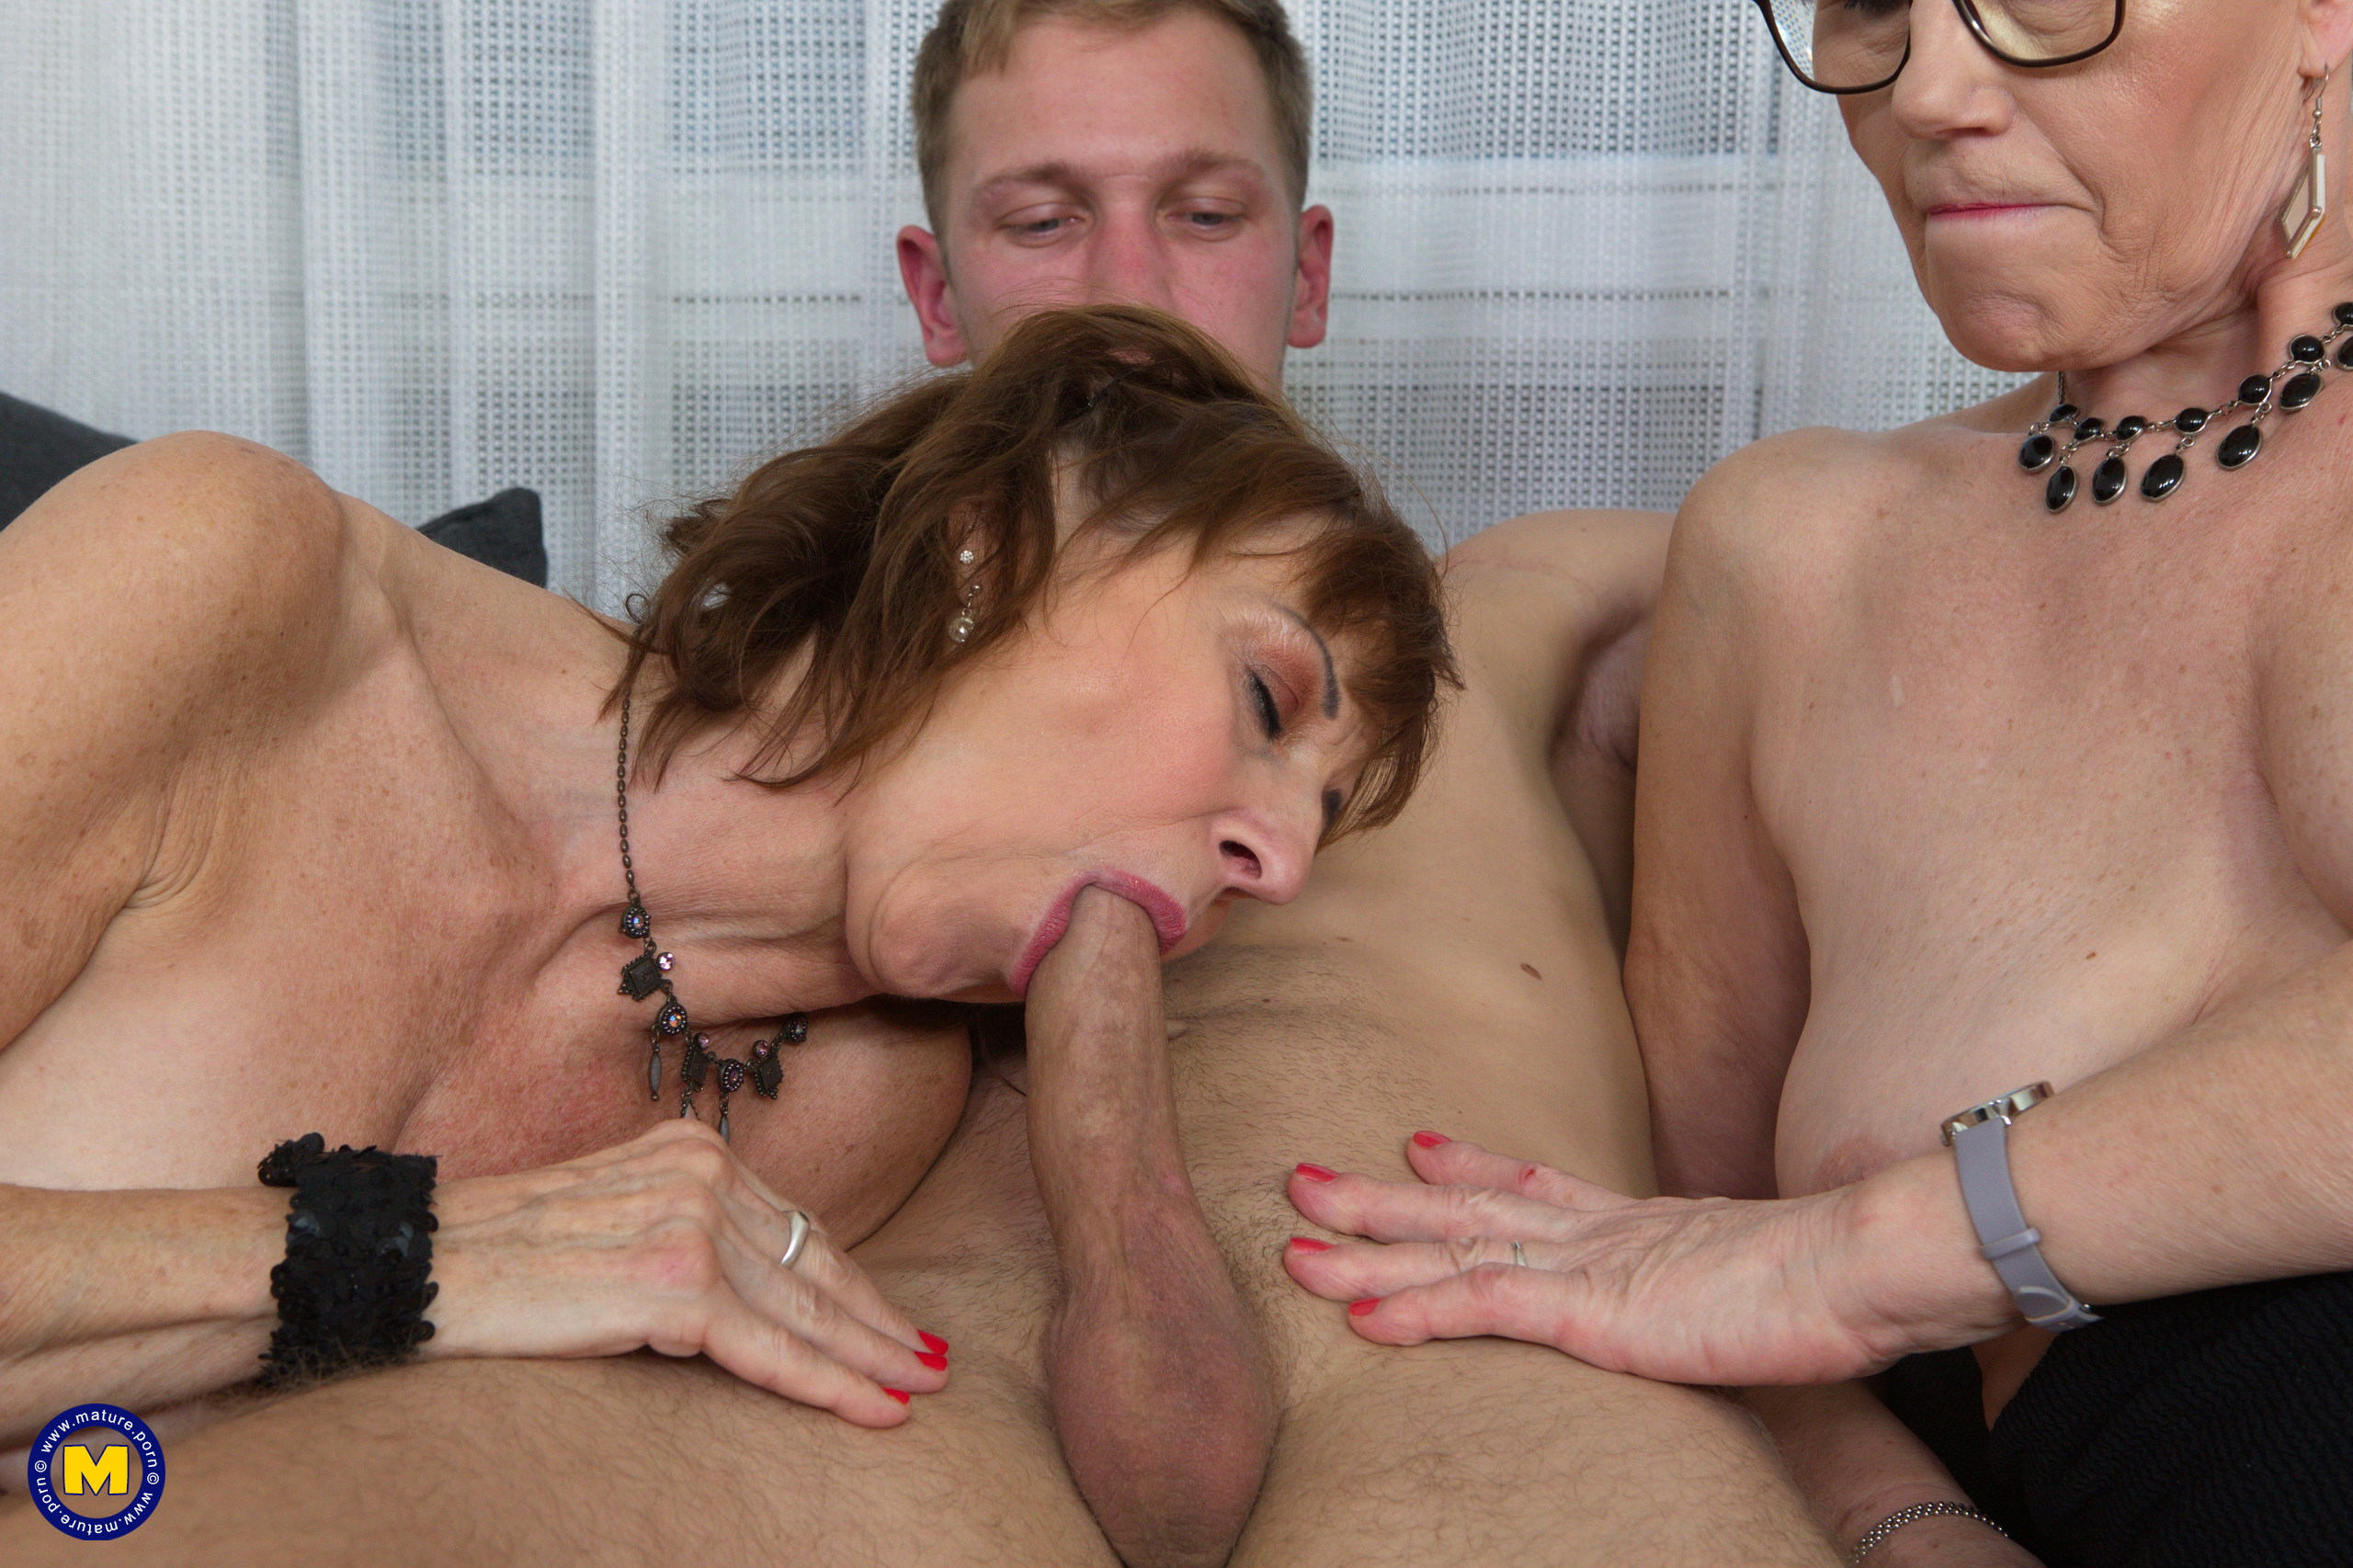 cartoon-mature-ladies-threesomes-with-graphic